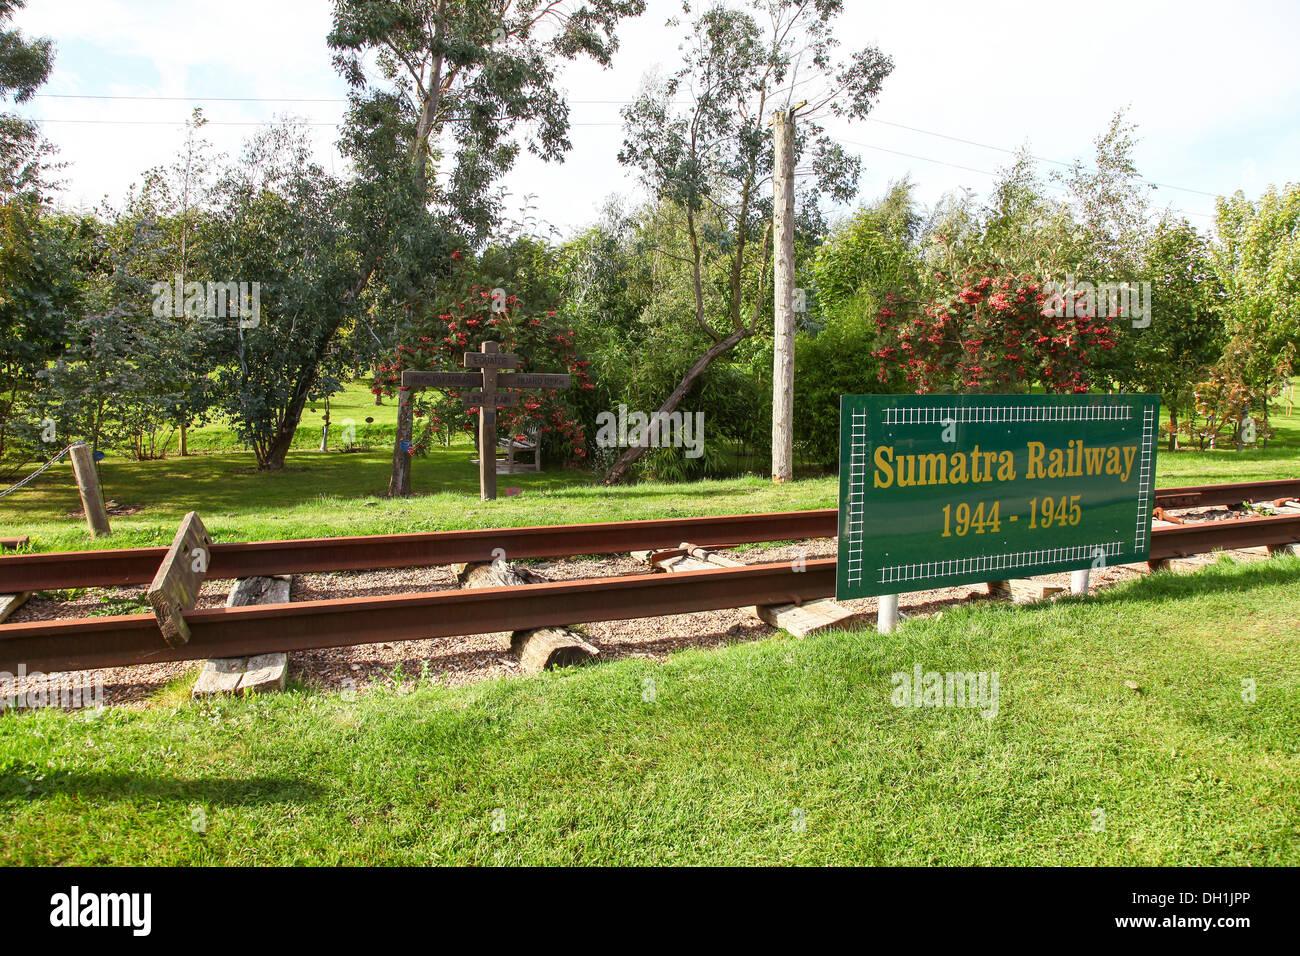 The Sumatra Railway memorial at The National Memorial Arboretum Alrewas, near Lichfield, Staffordshire, England, UK - Stock Image